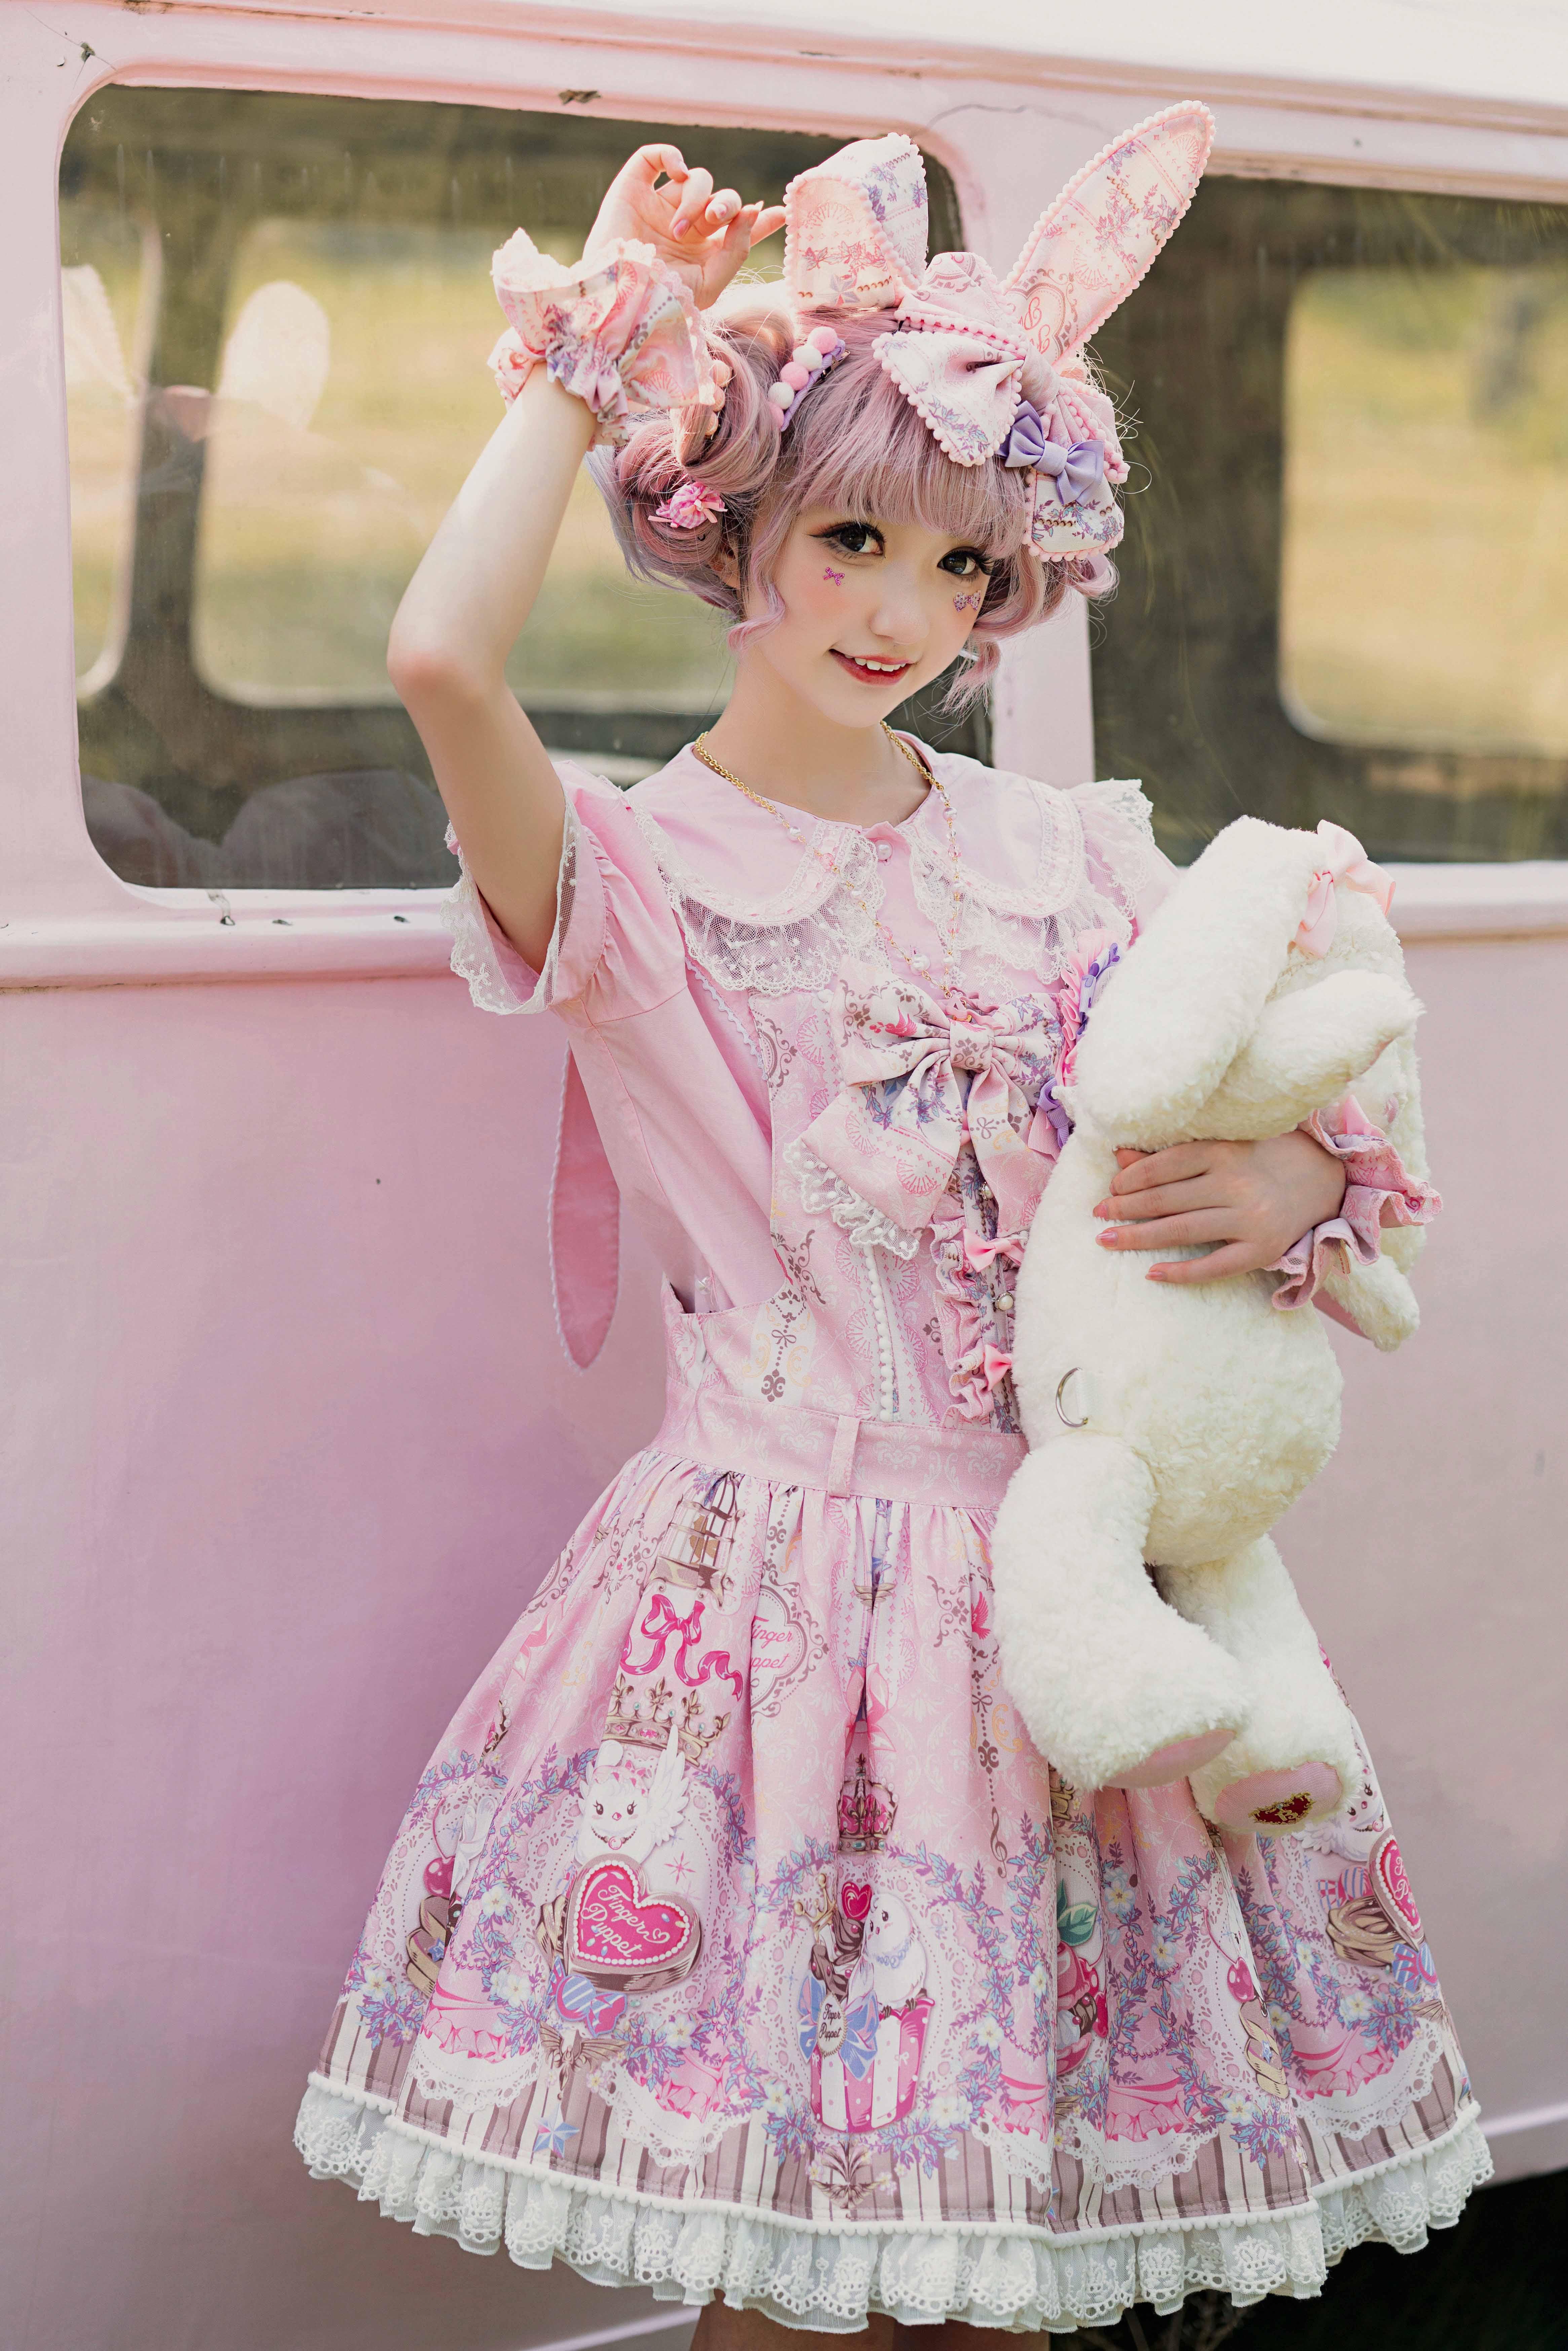 [fingertip puppet studio] [wenniao sweetheart] SK strap / Lolita / tail Lolita